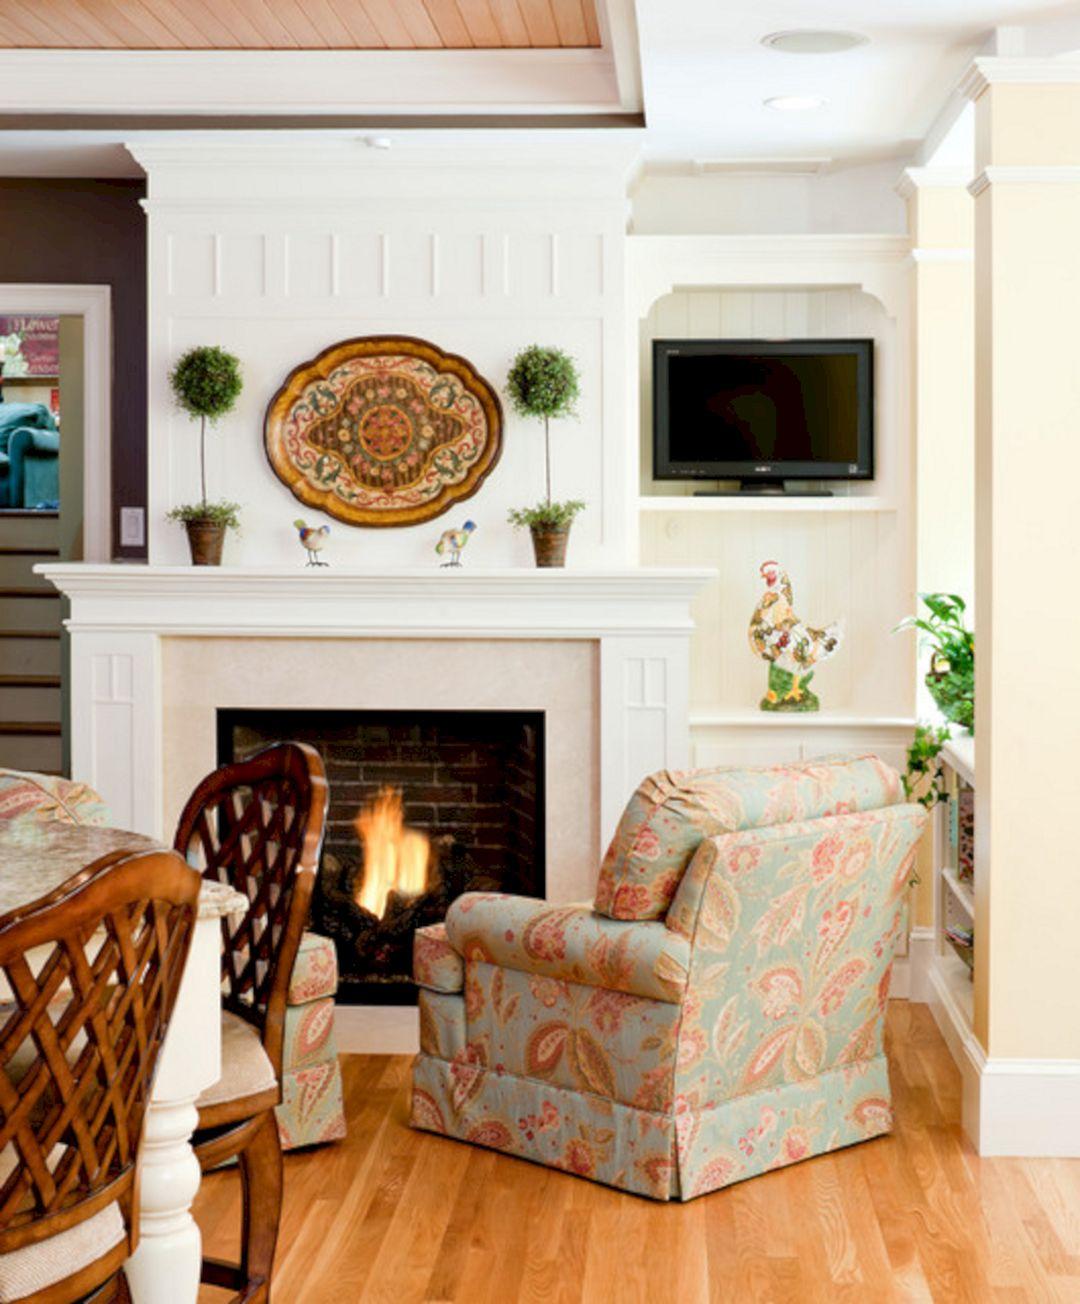 Home Design Ideas For Living Room: Kitchen Sitting Area With Fireplace (Kitchen Sitting Area